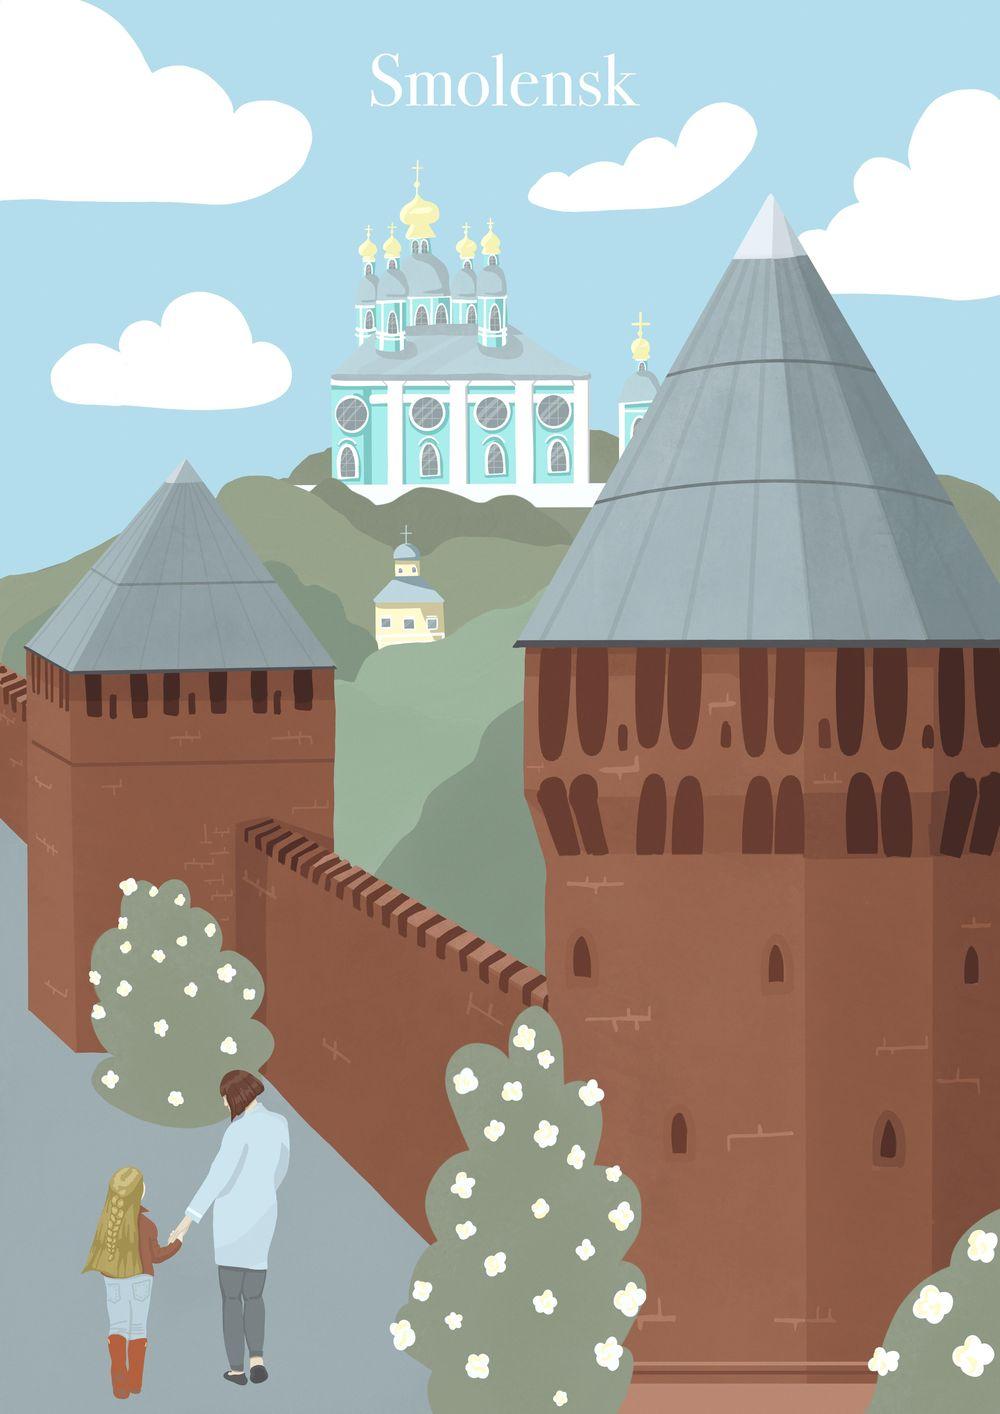 Smolensk - image 1 - student project